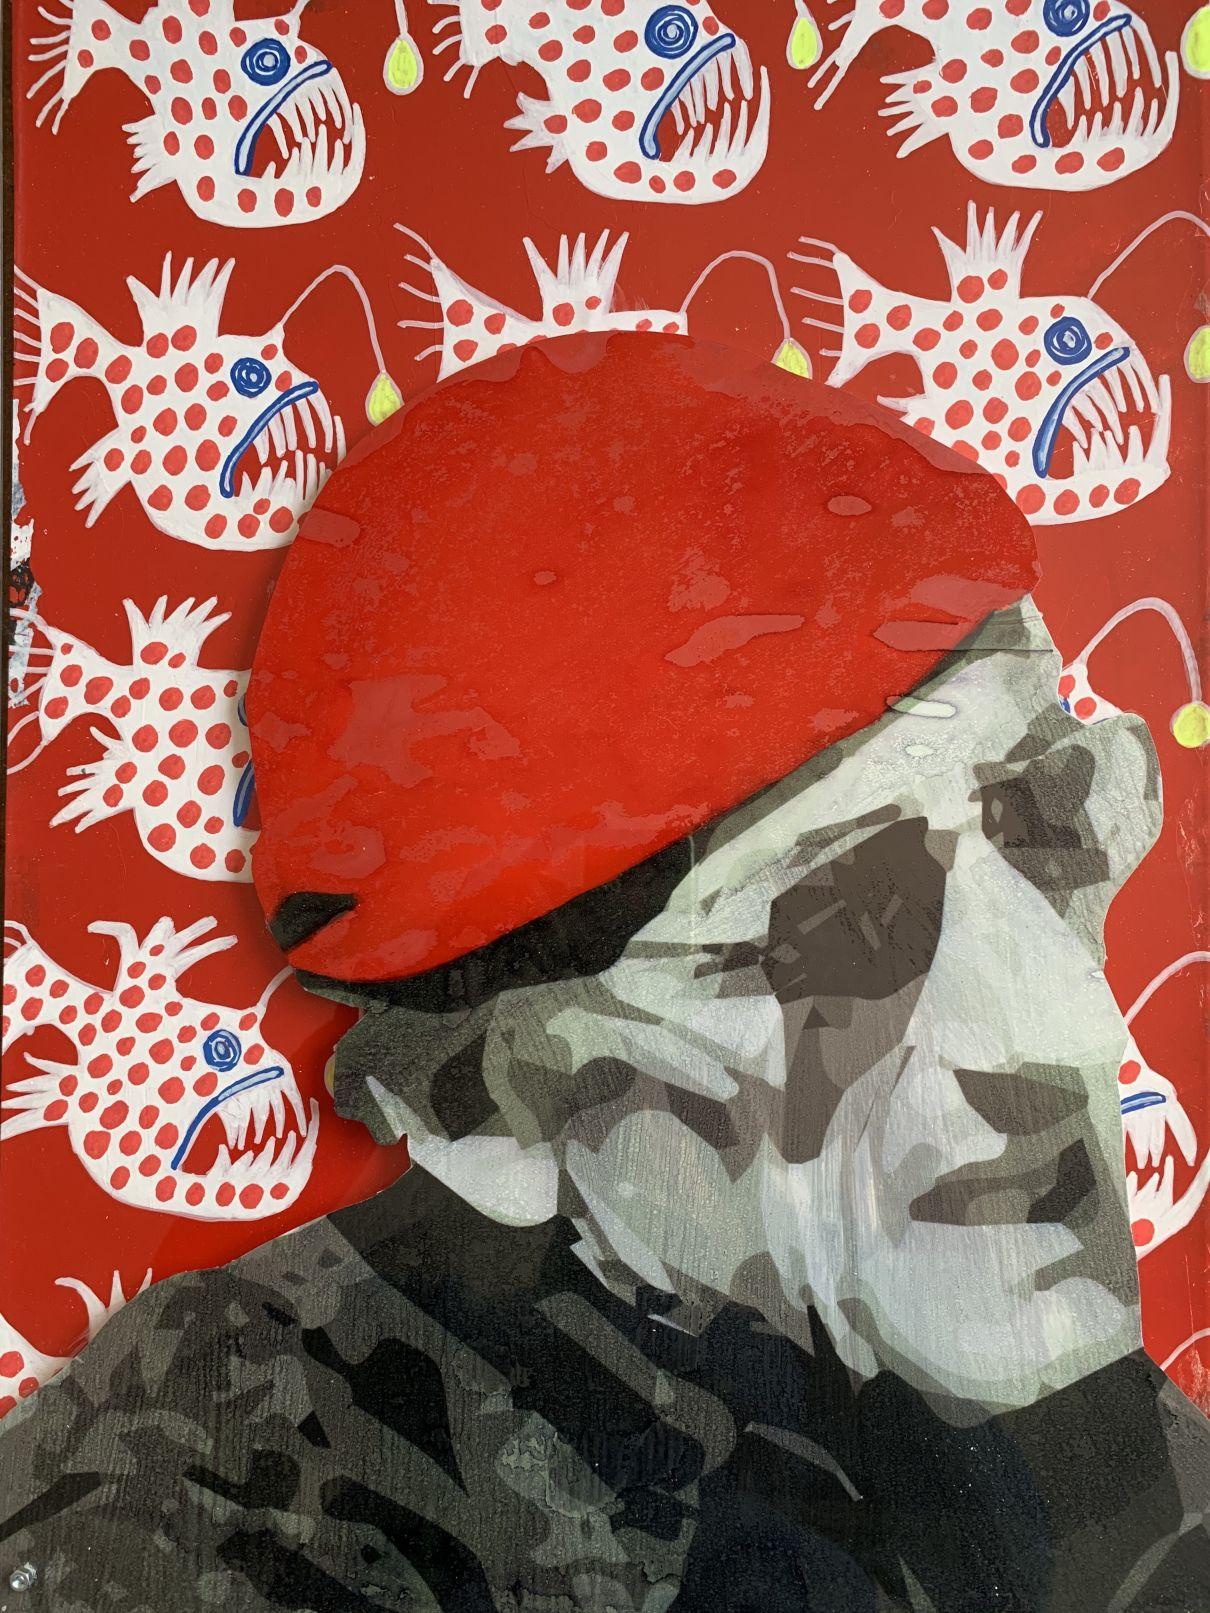 Save the Oceans (2020) - Kako Street Art